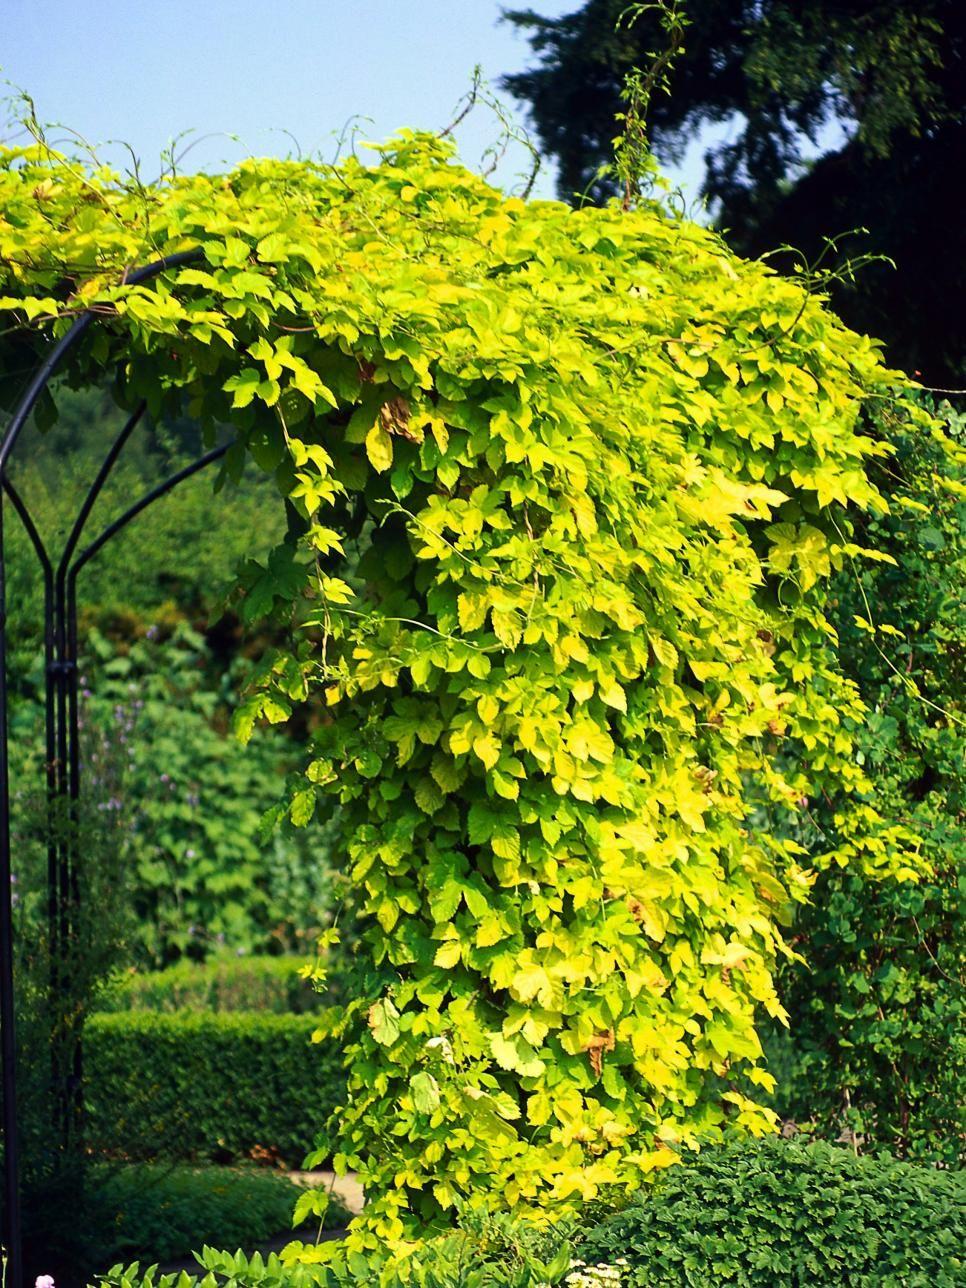 Vines For Arches And Pergolas Garden Pinterest Garden Plants